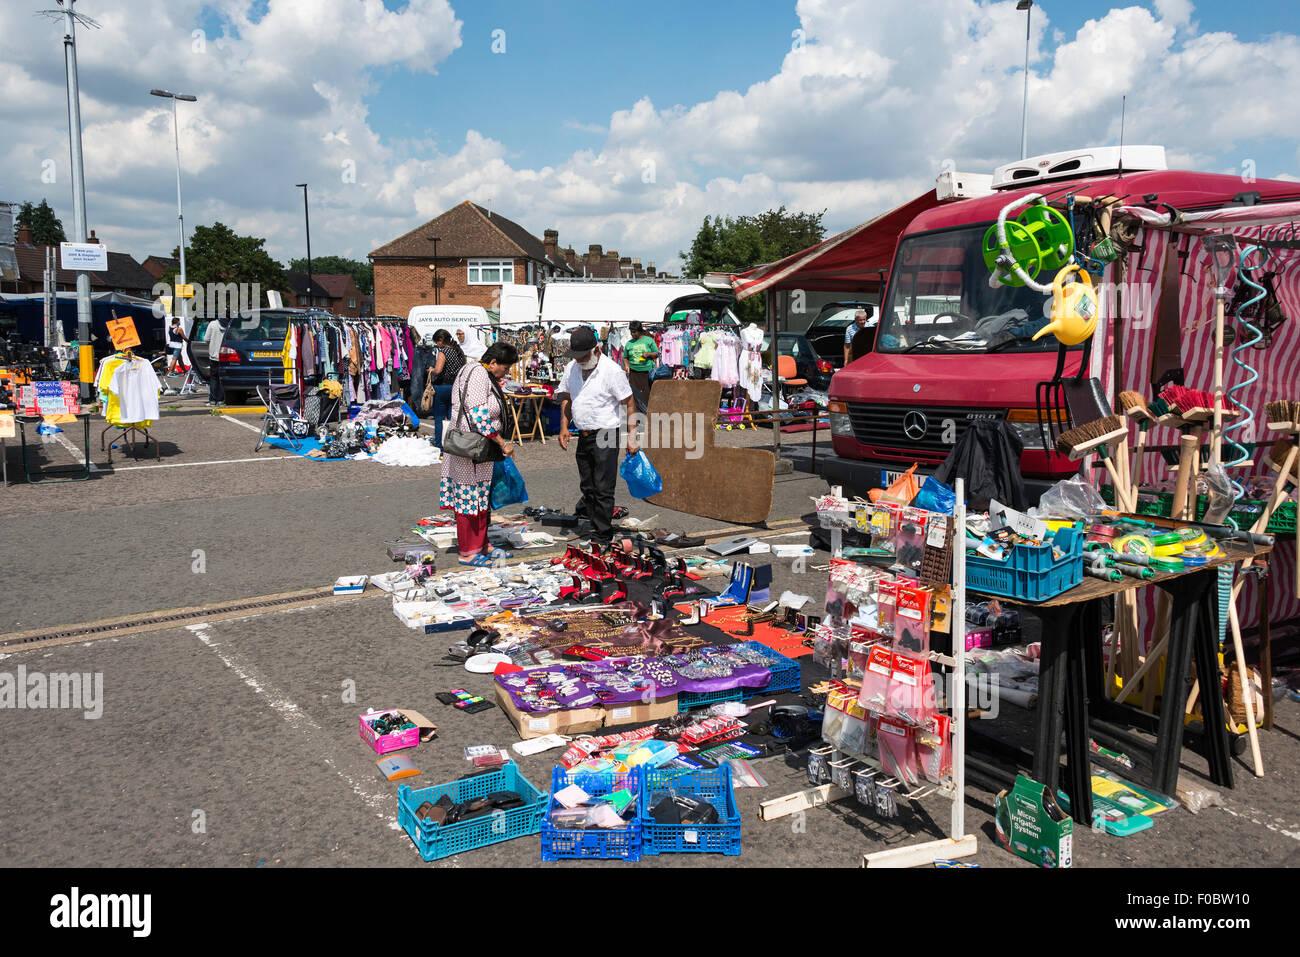 Hounslow West Car Park Car Boot Market, Hounslow West, London Borough of Hounslow, Greater London, England, United - Stock Image